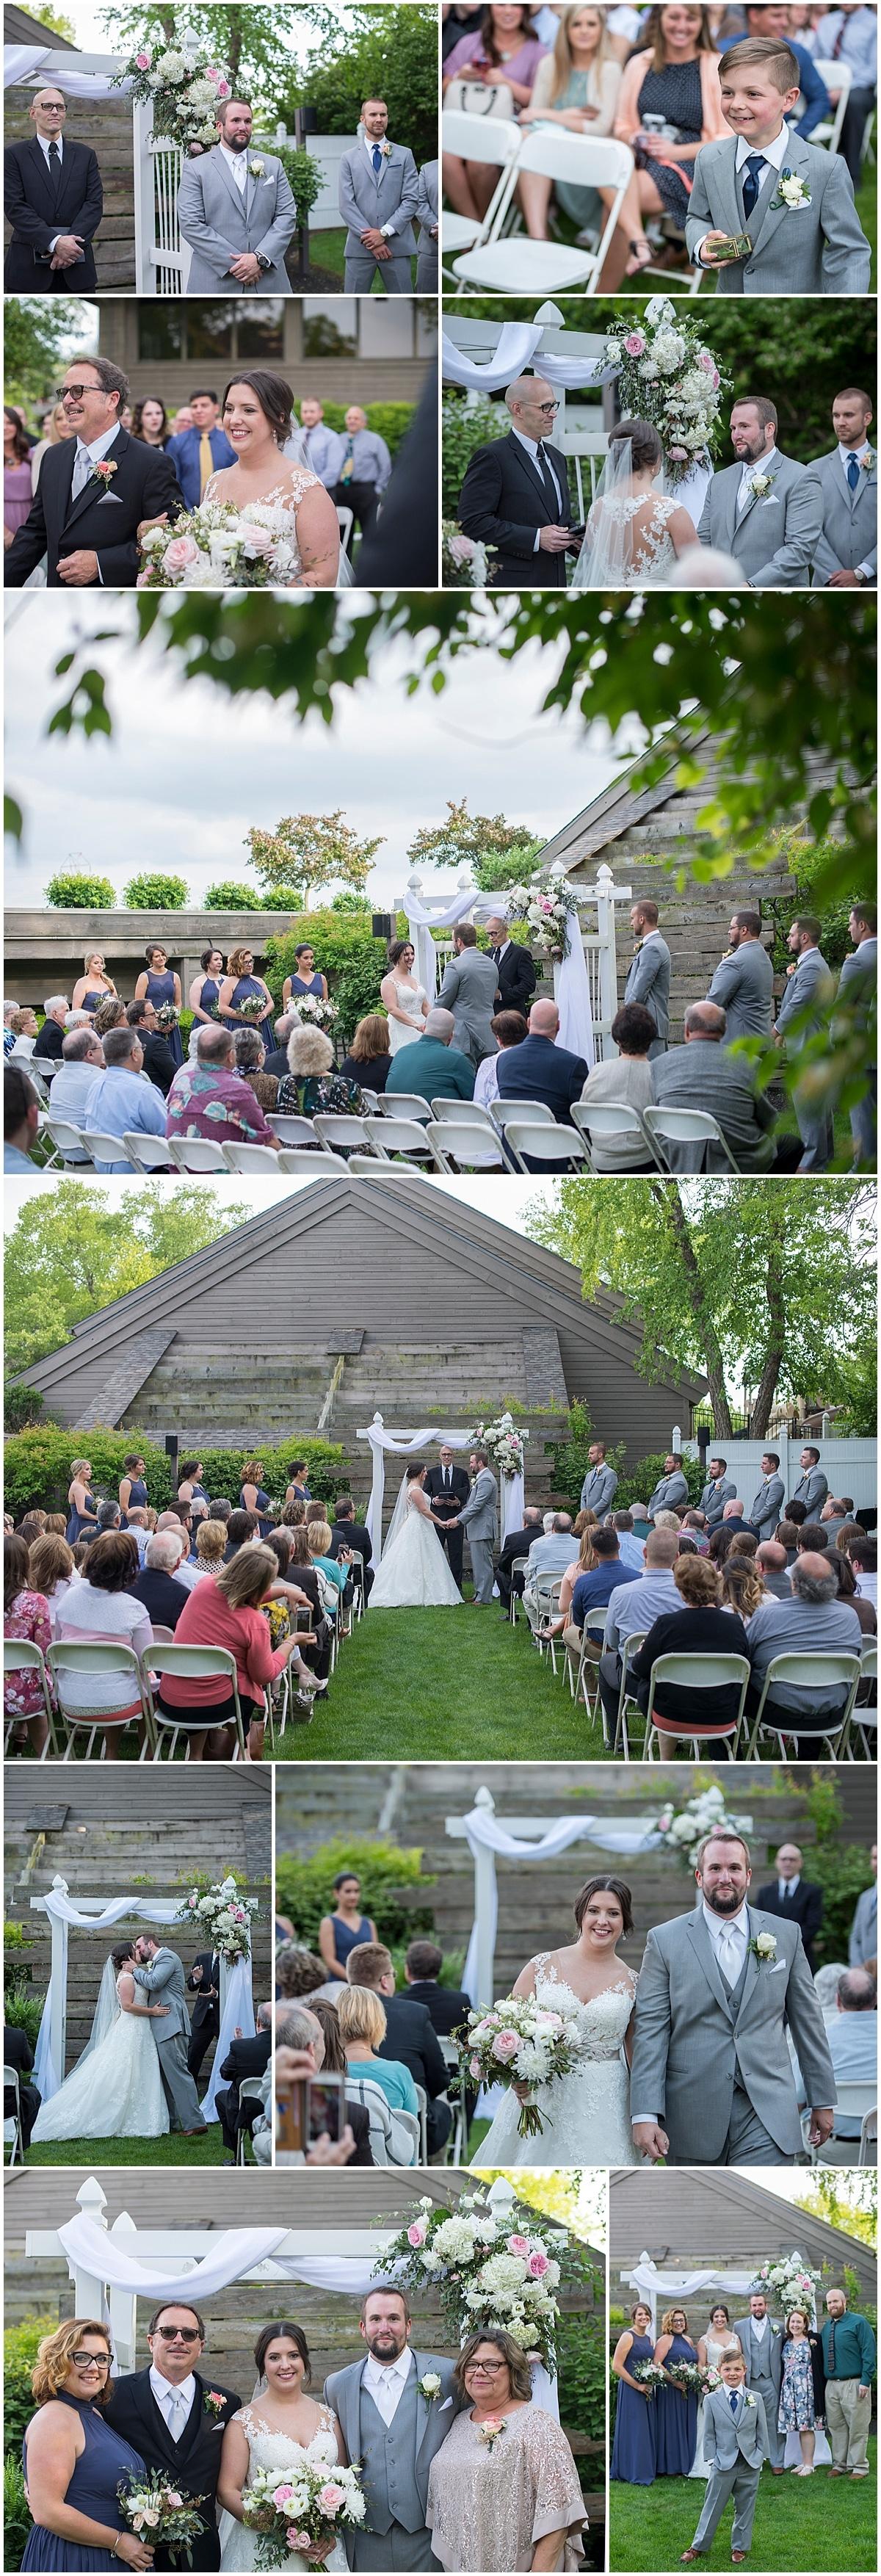 Watersedge event center Wedding ceremony Hilliard oh